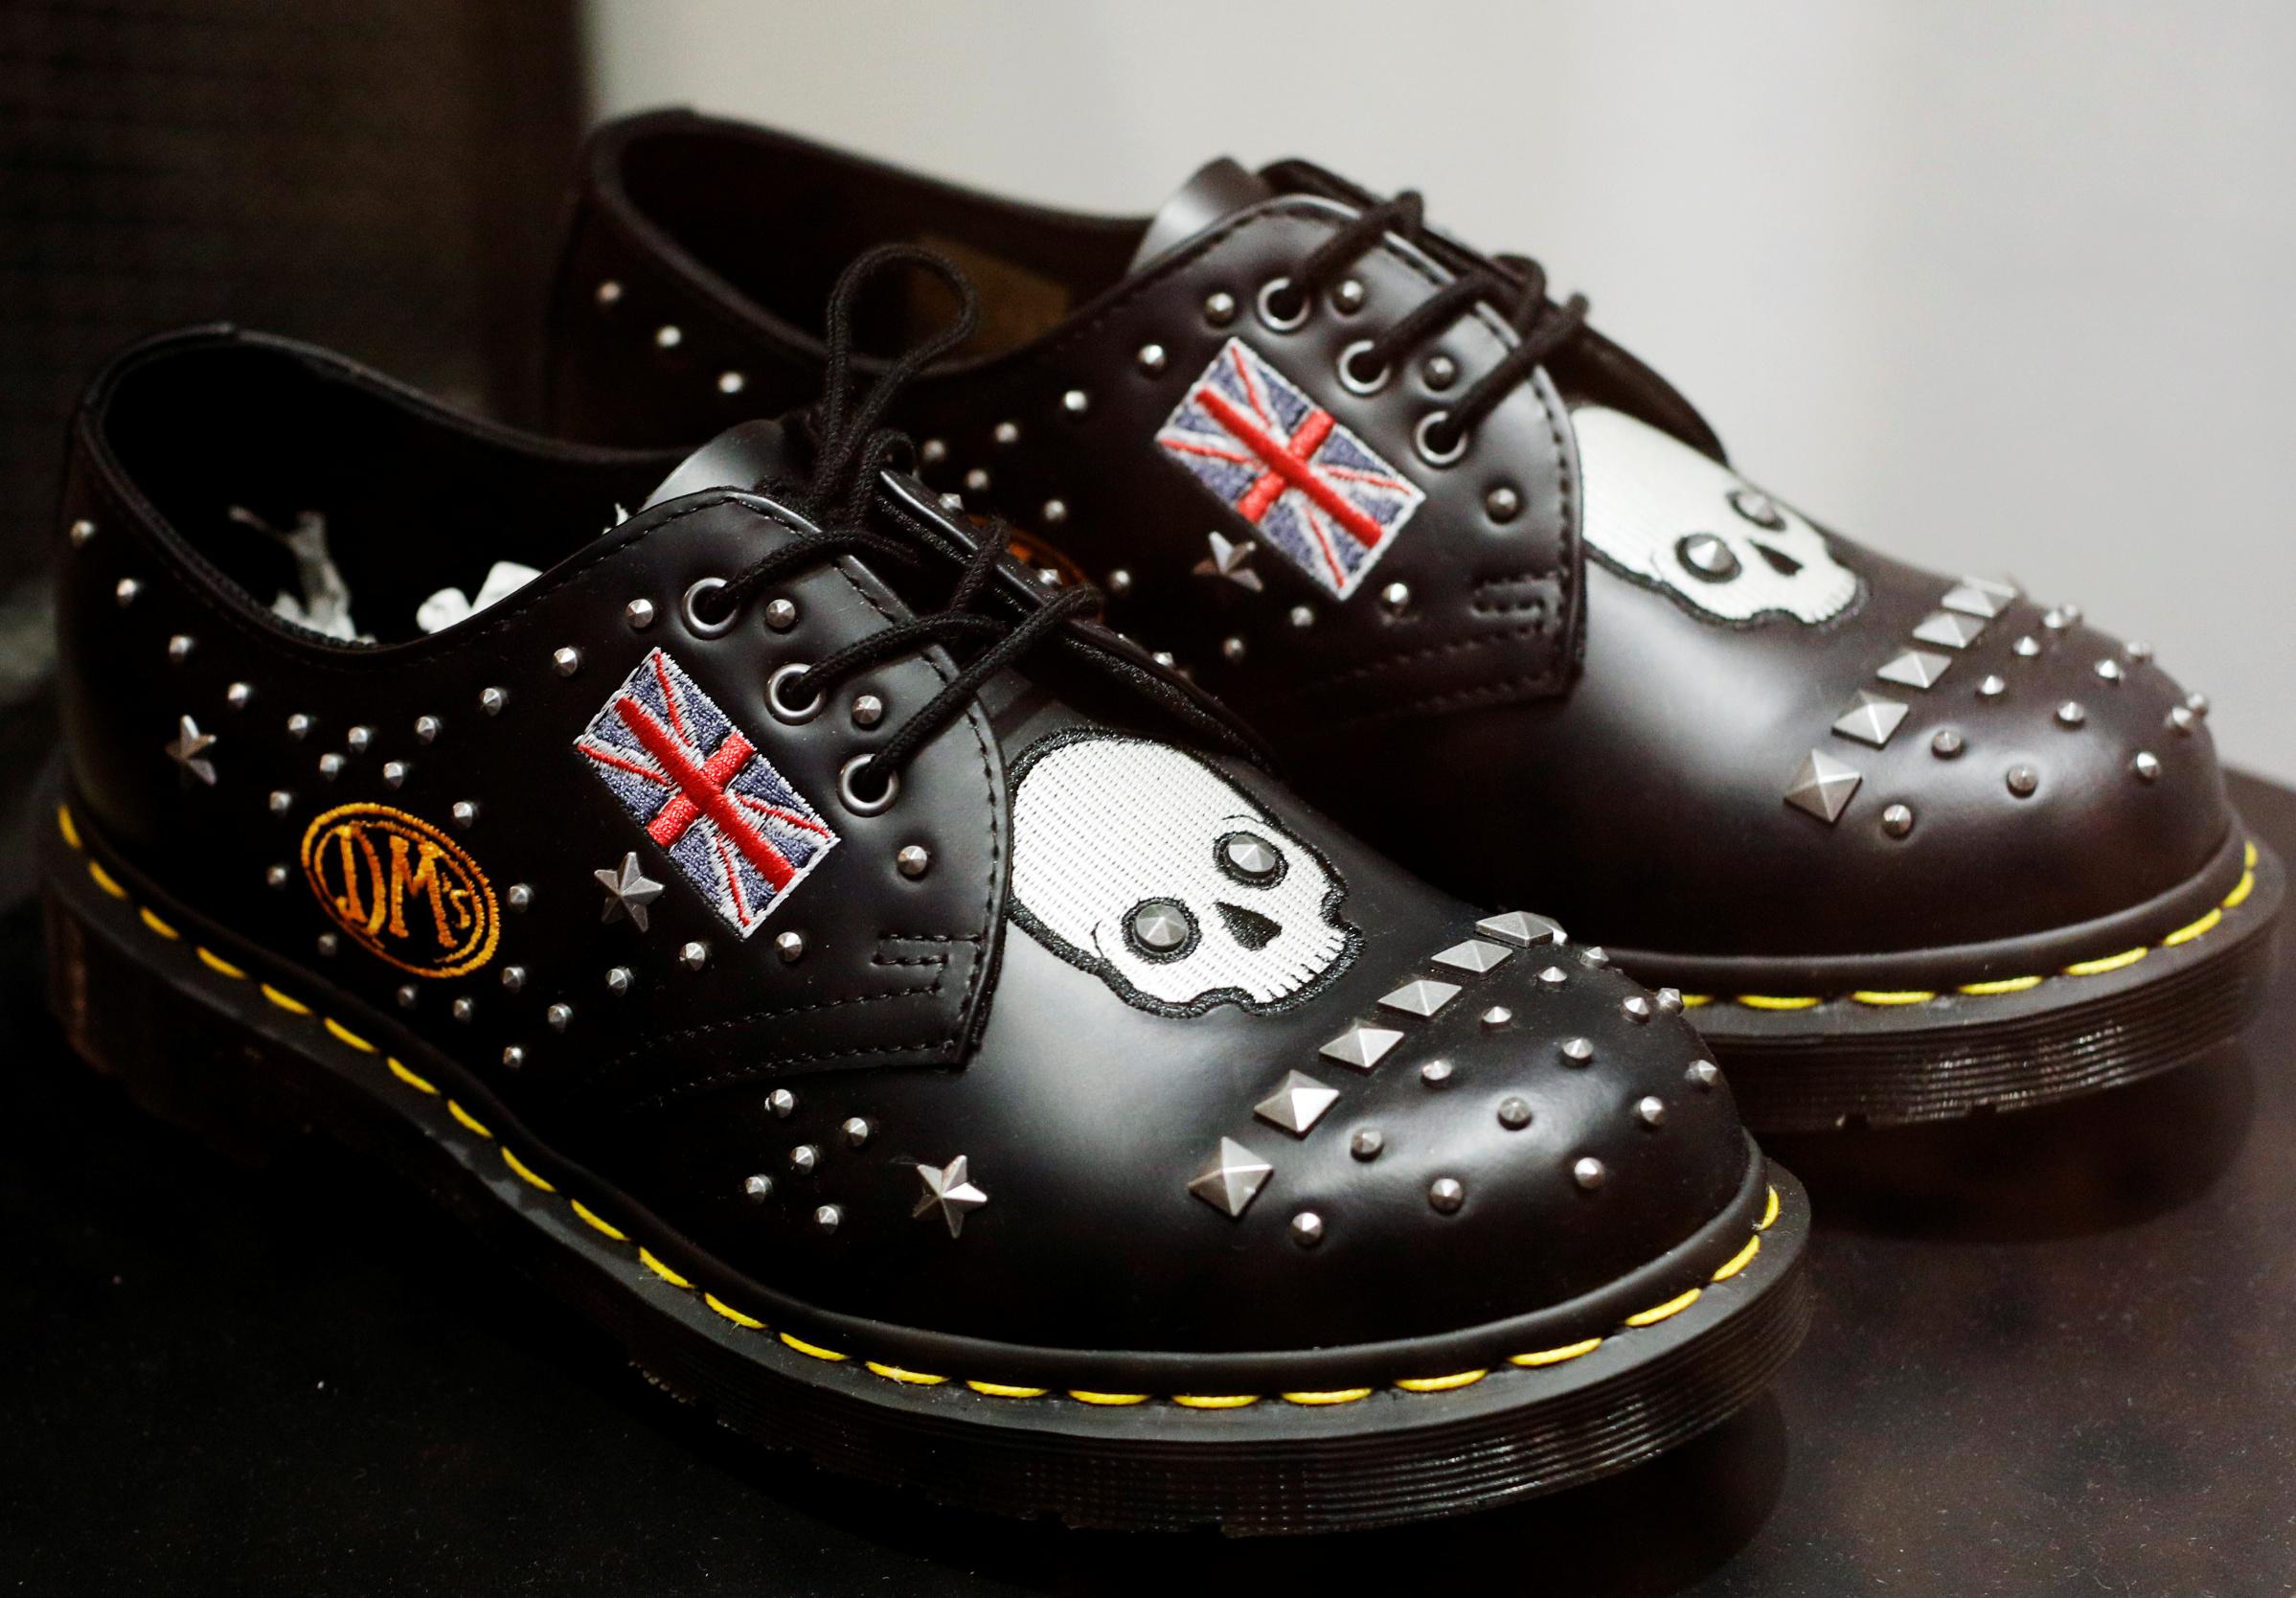 Ilustracija: cipele brenda Dr. Martens